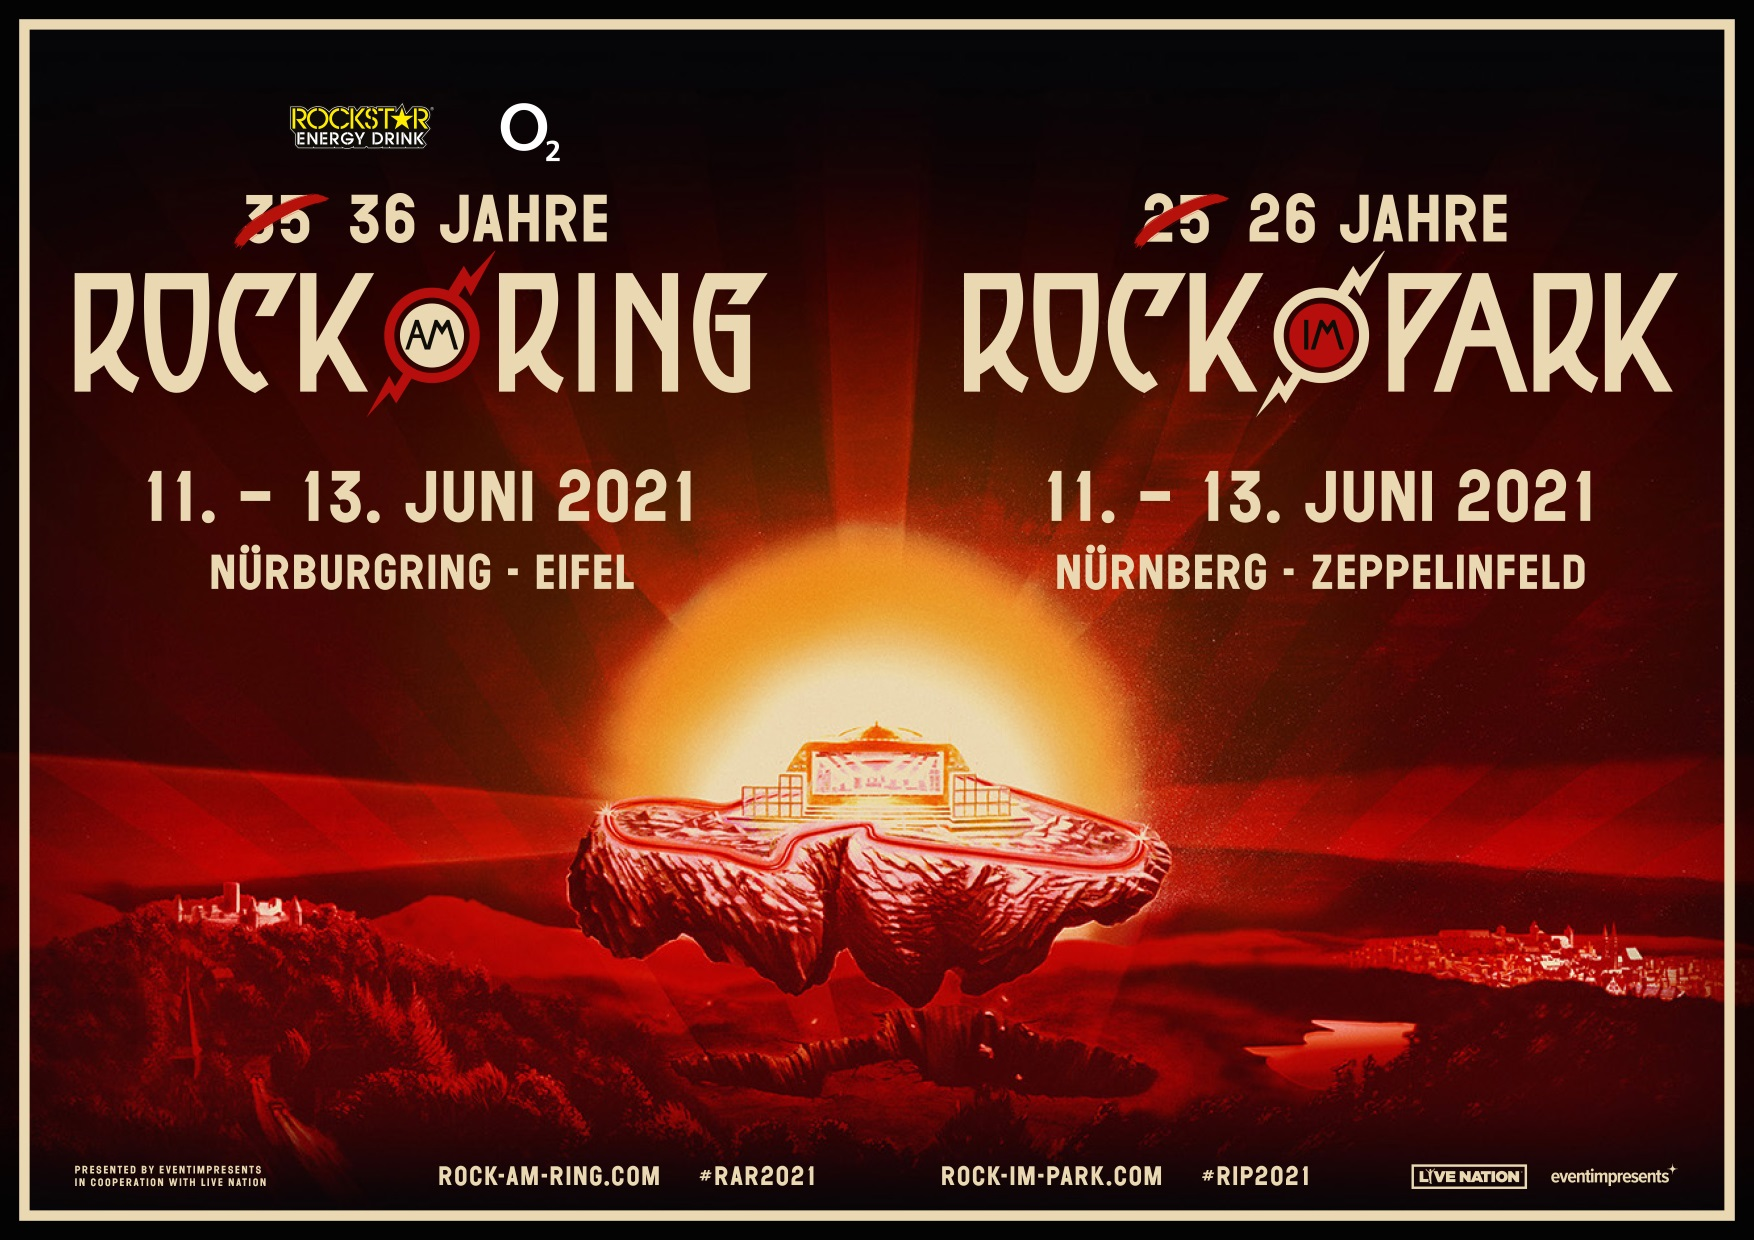 Rock Am Ring Live Im Tv 2021